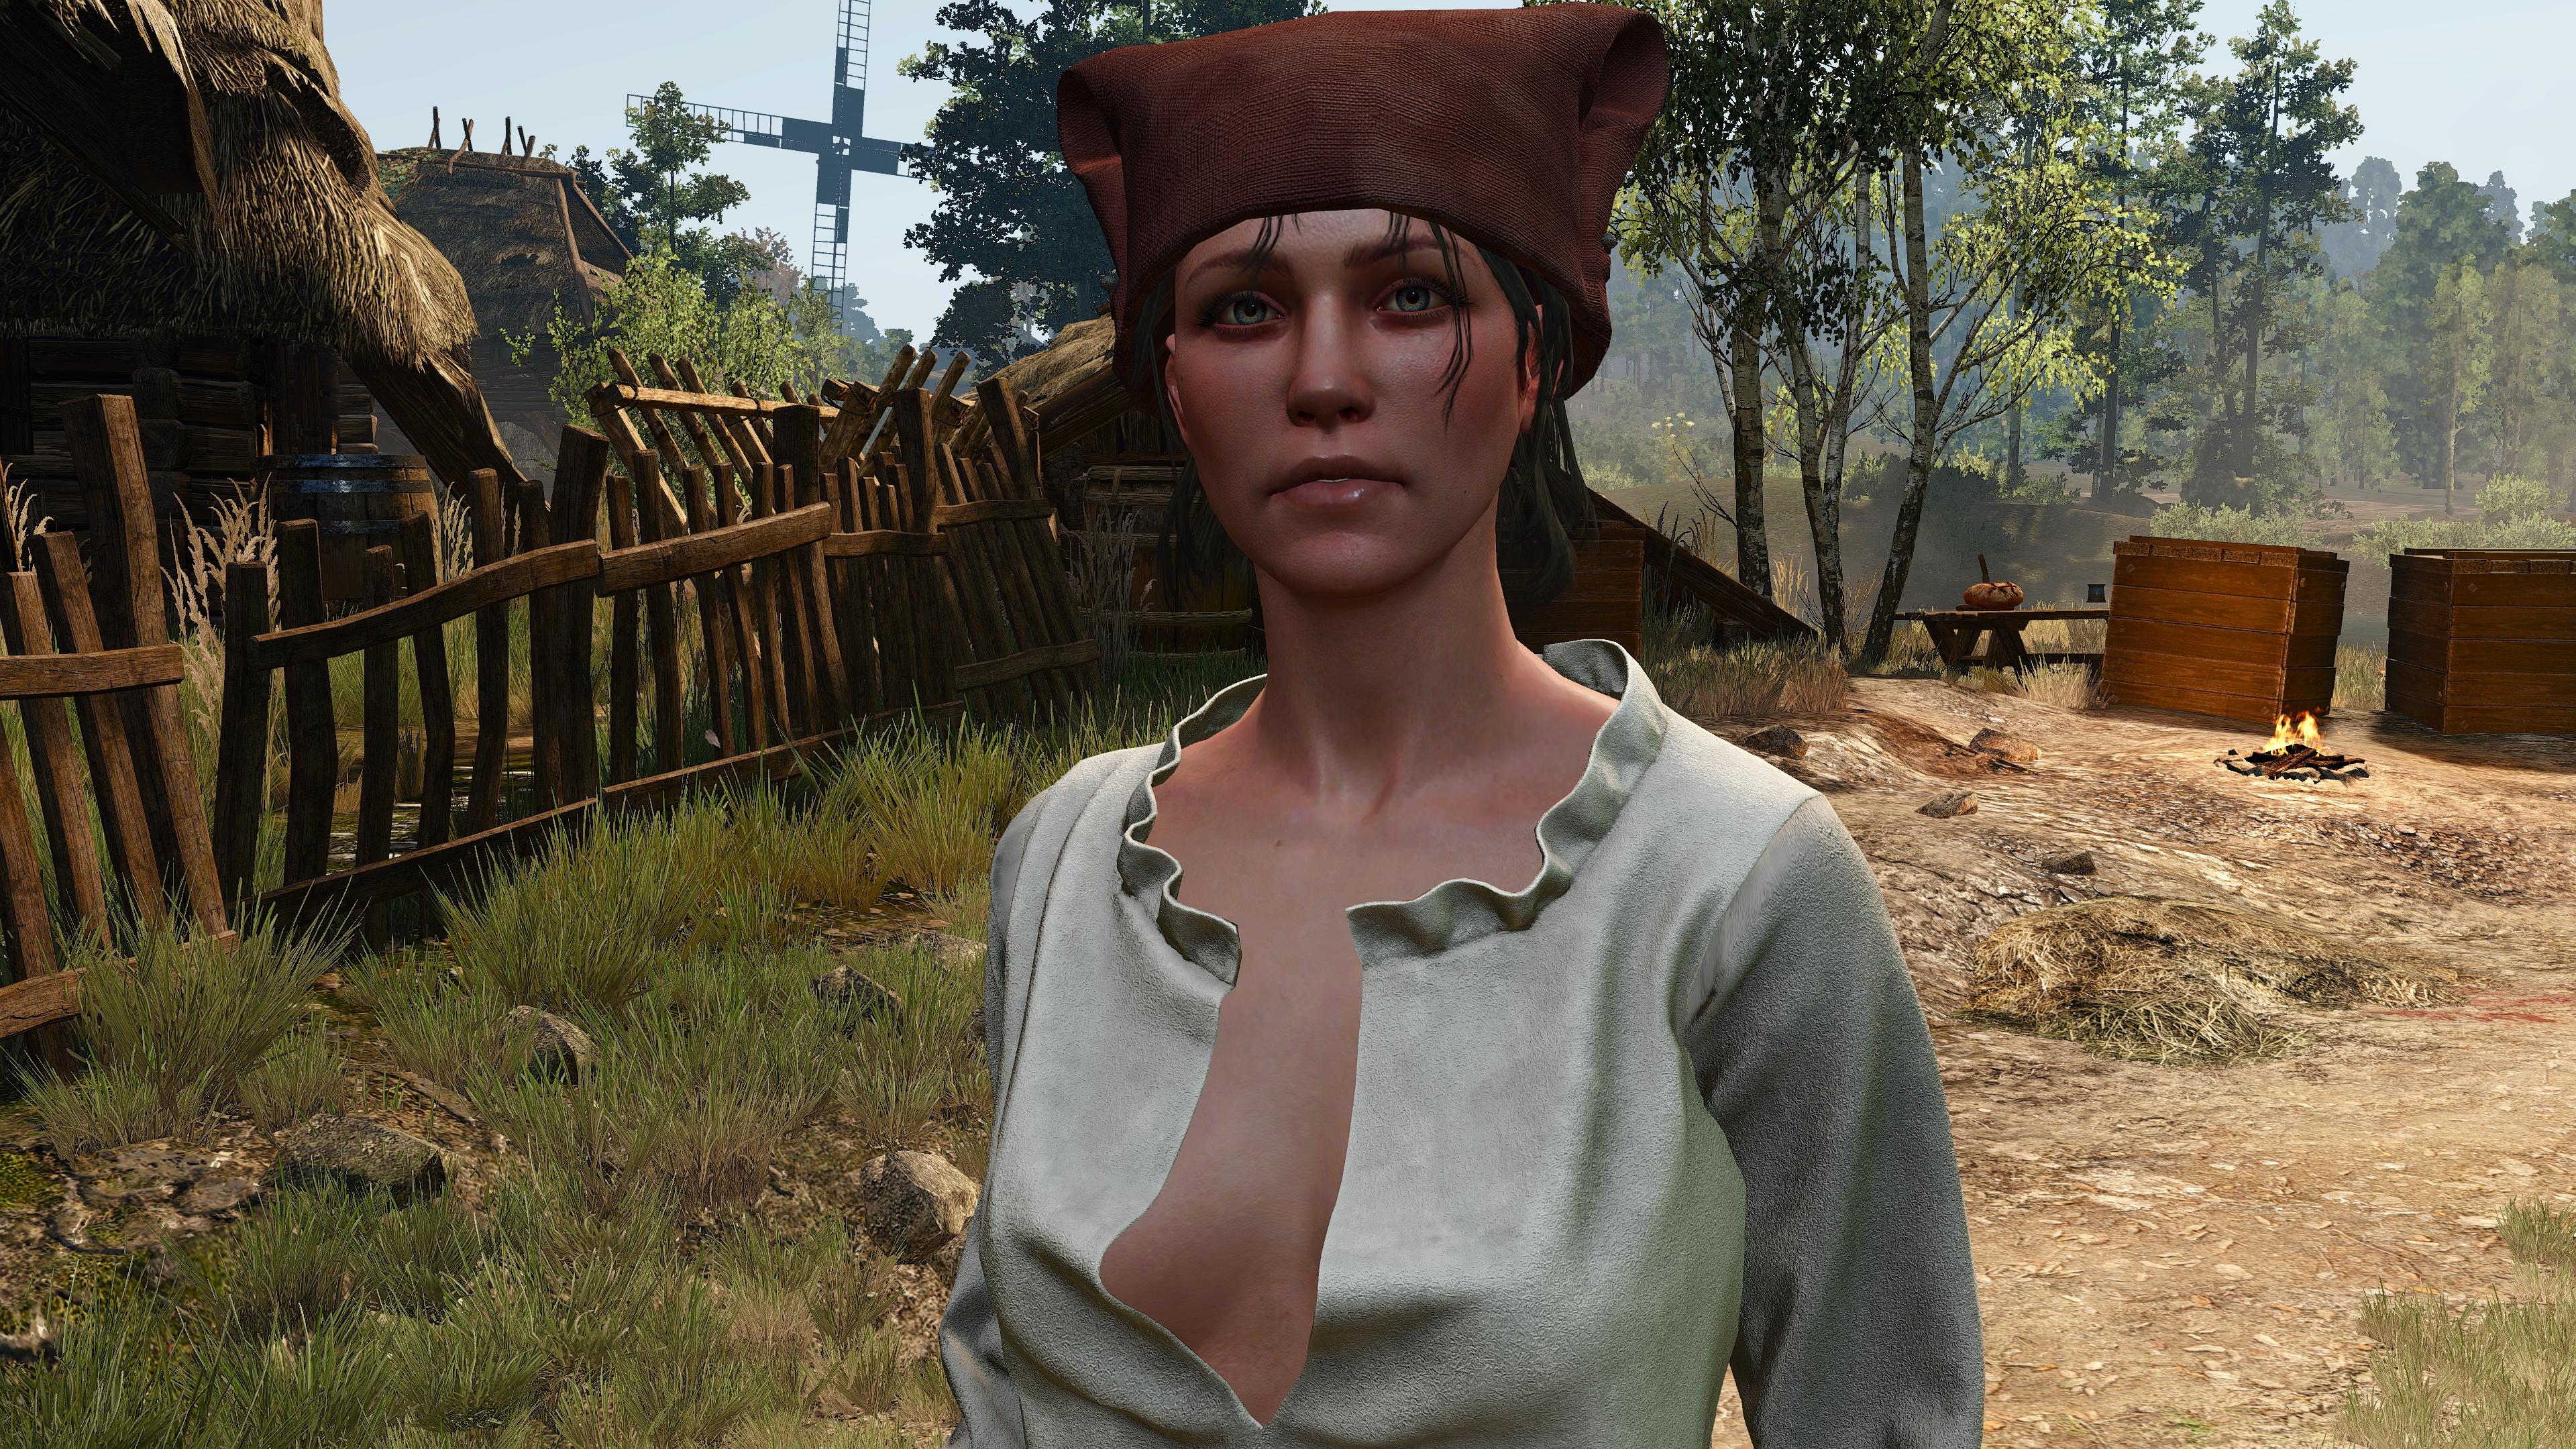 The Witcher 3 Screenshot 2020.07.17 - 16.58.43.51.jpg - The Witcher 3: Wild Hunt